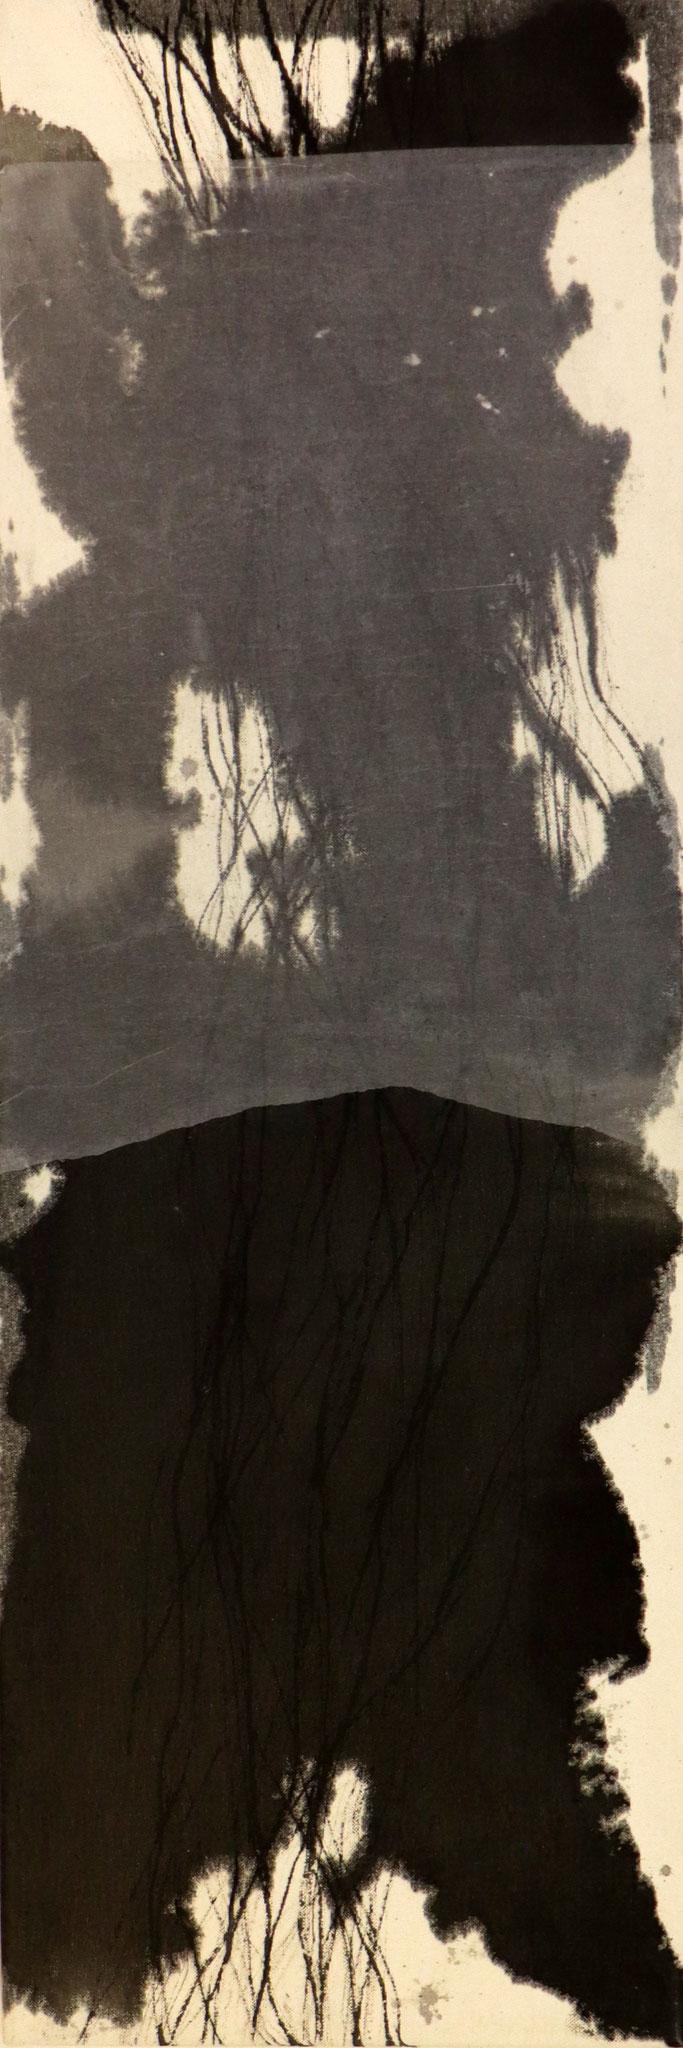 Serie 'Traces' 2020 -  Tusche & Seidenpapier auf Leinwand / ink & silk paper on canvas - 30 x 90 x 2 cm